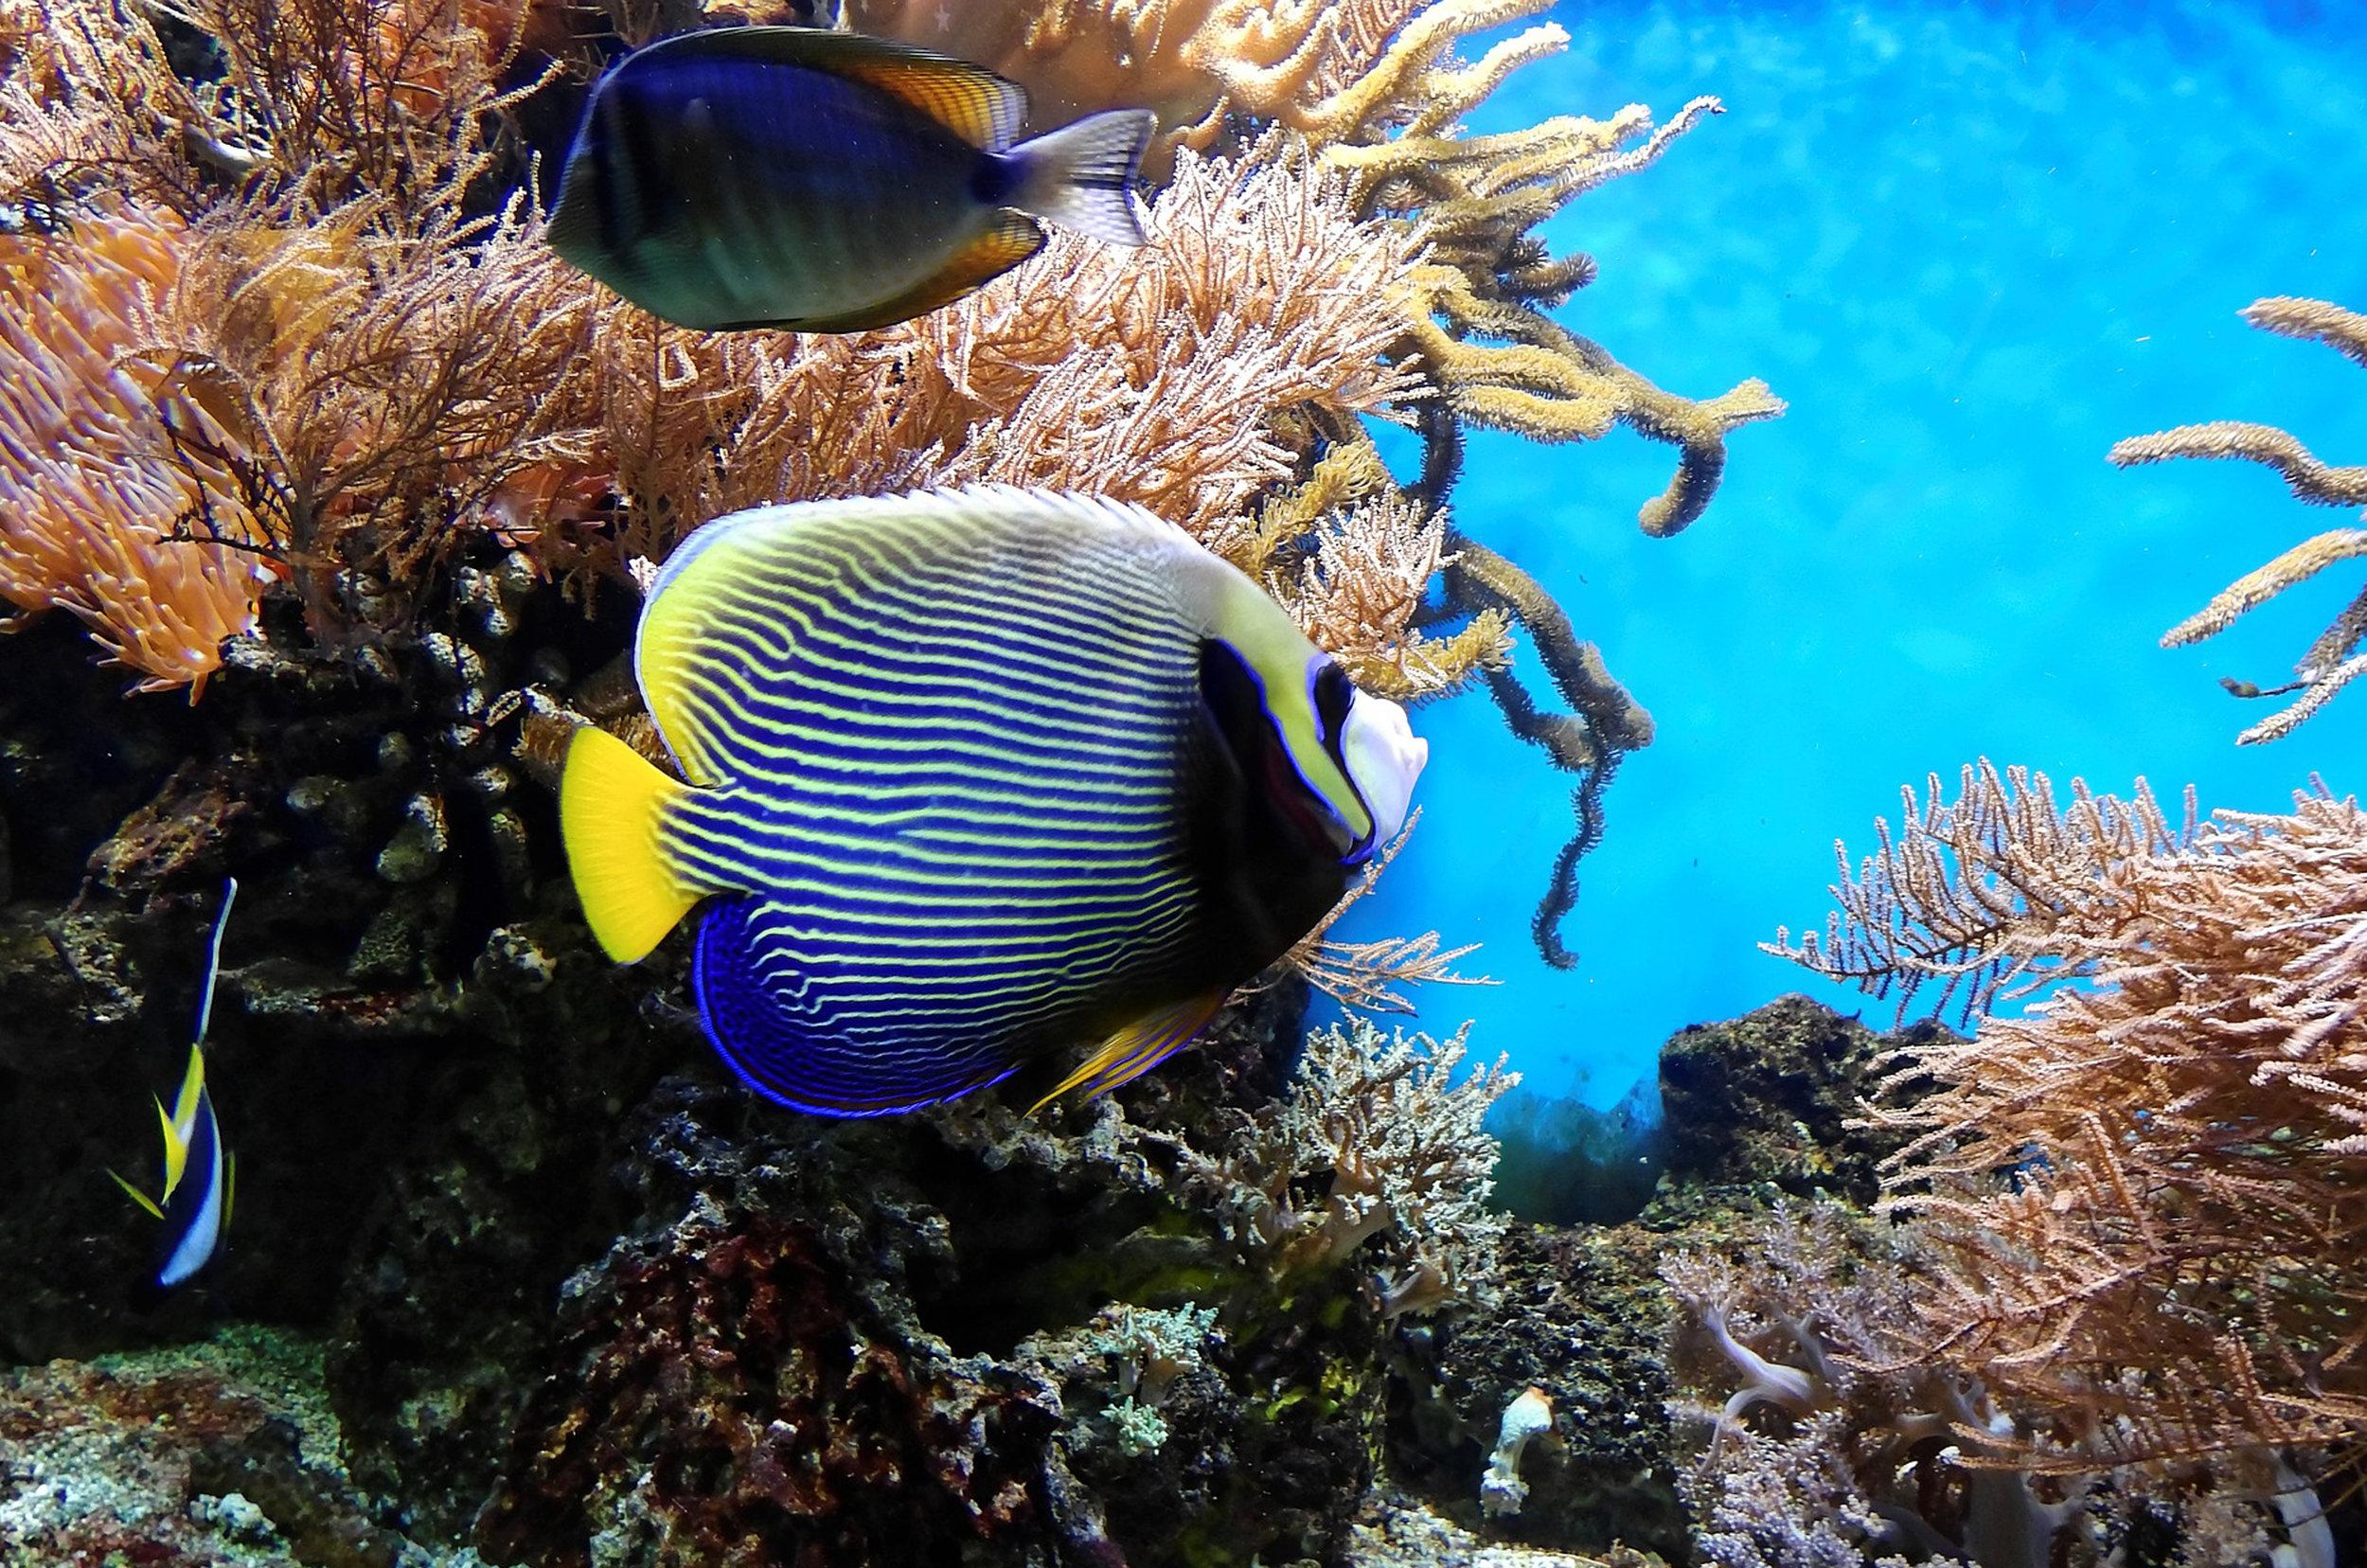 Fish_Img1.jpg